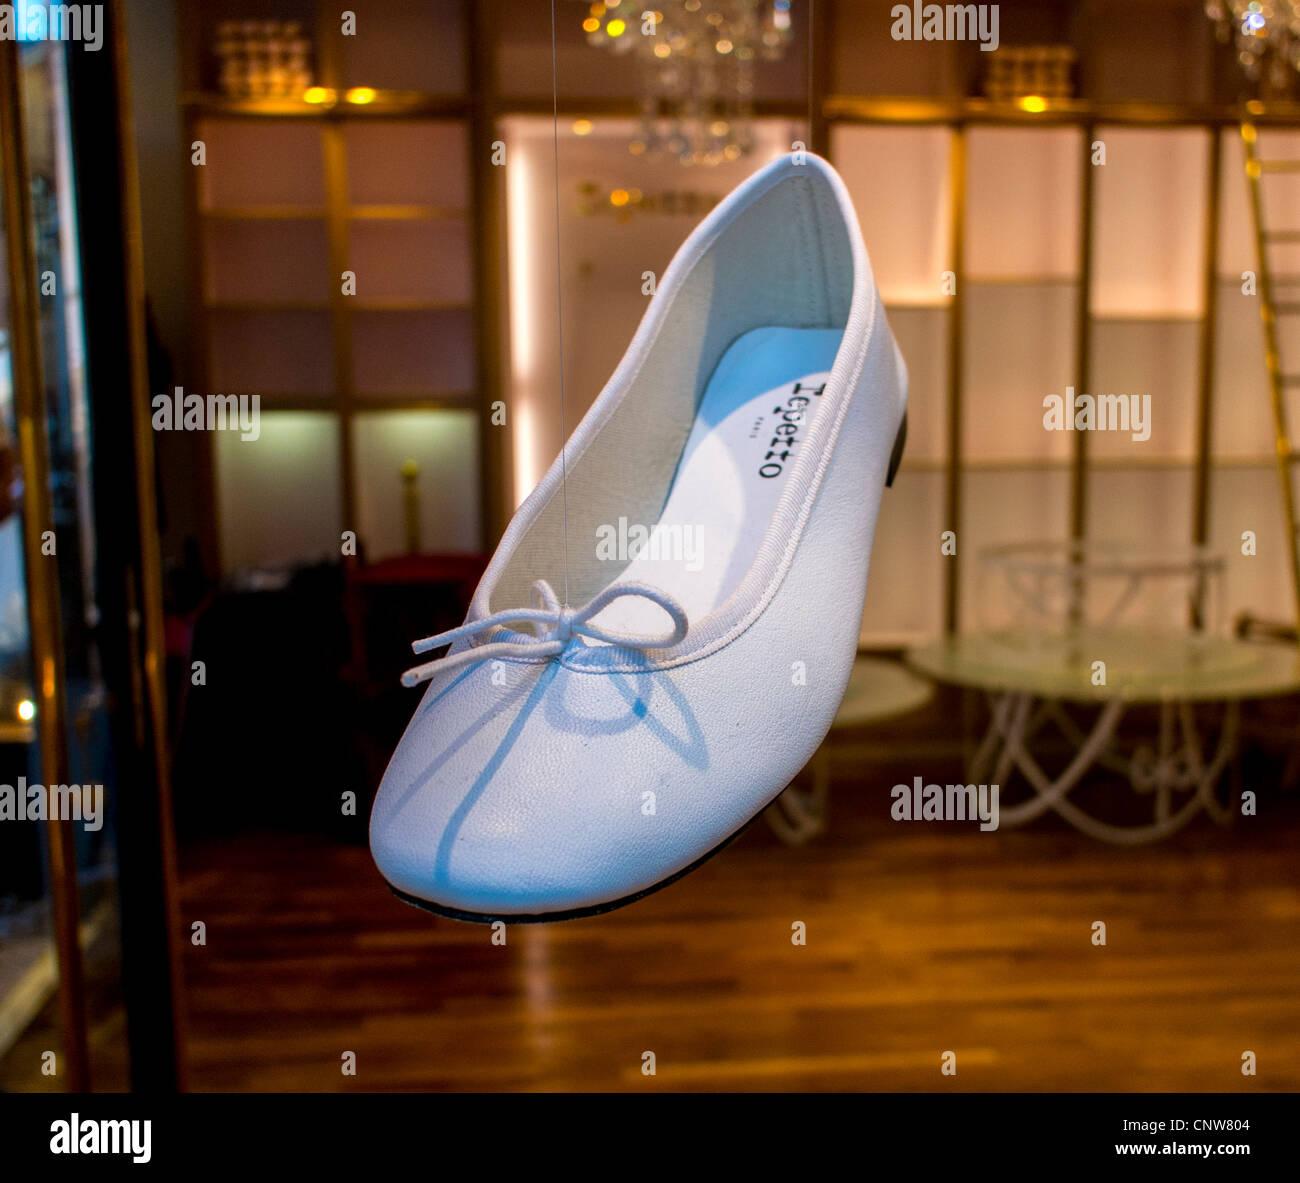 Dancing Shoes Stores In Hong Kong